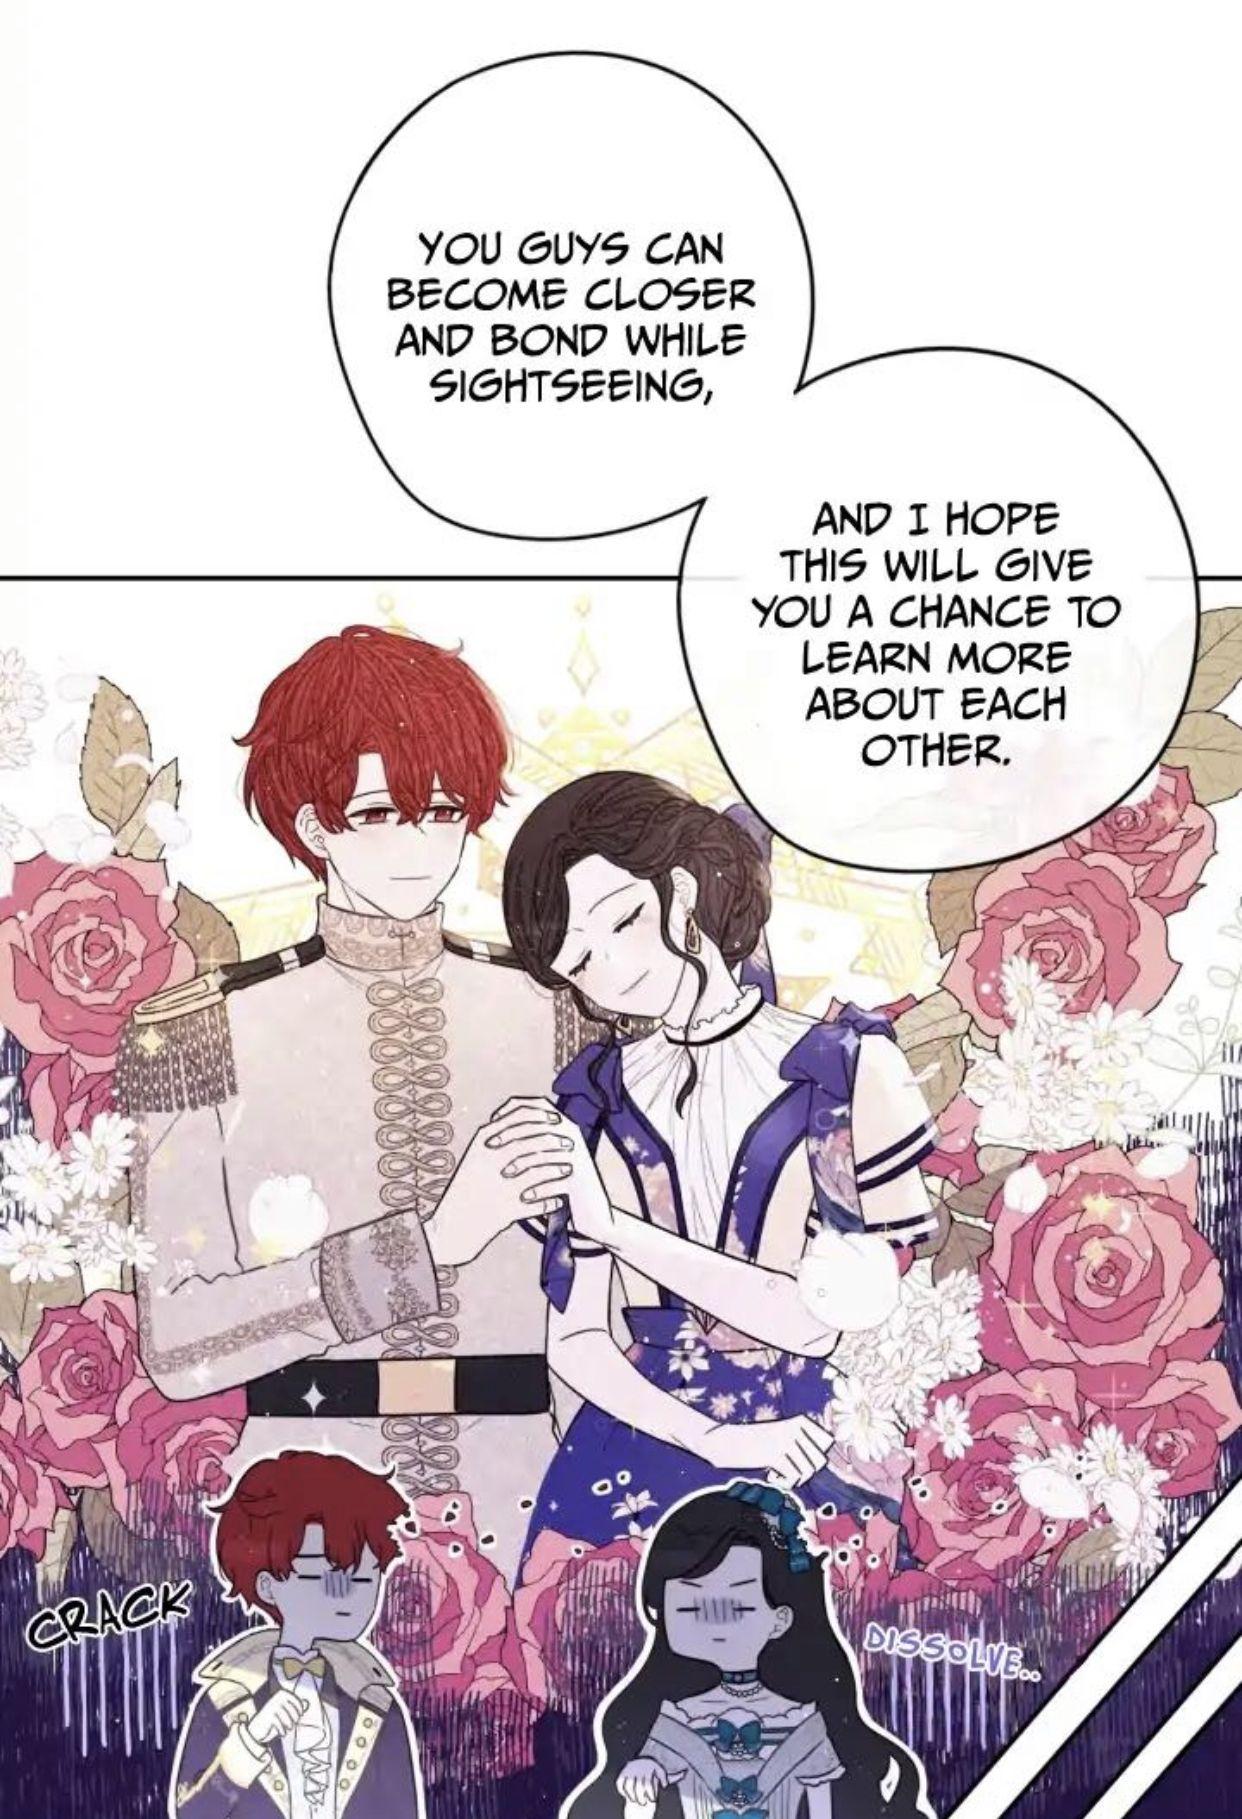 Chap 25 en 2020 Cómics manga, Anime romanticos, Manhwa